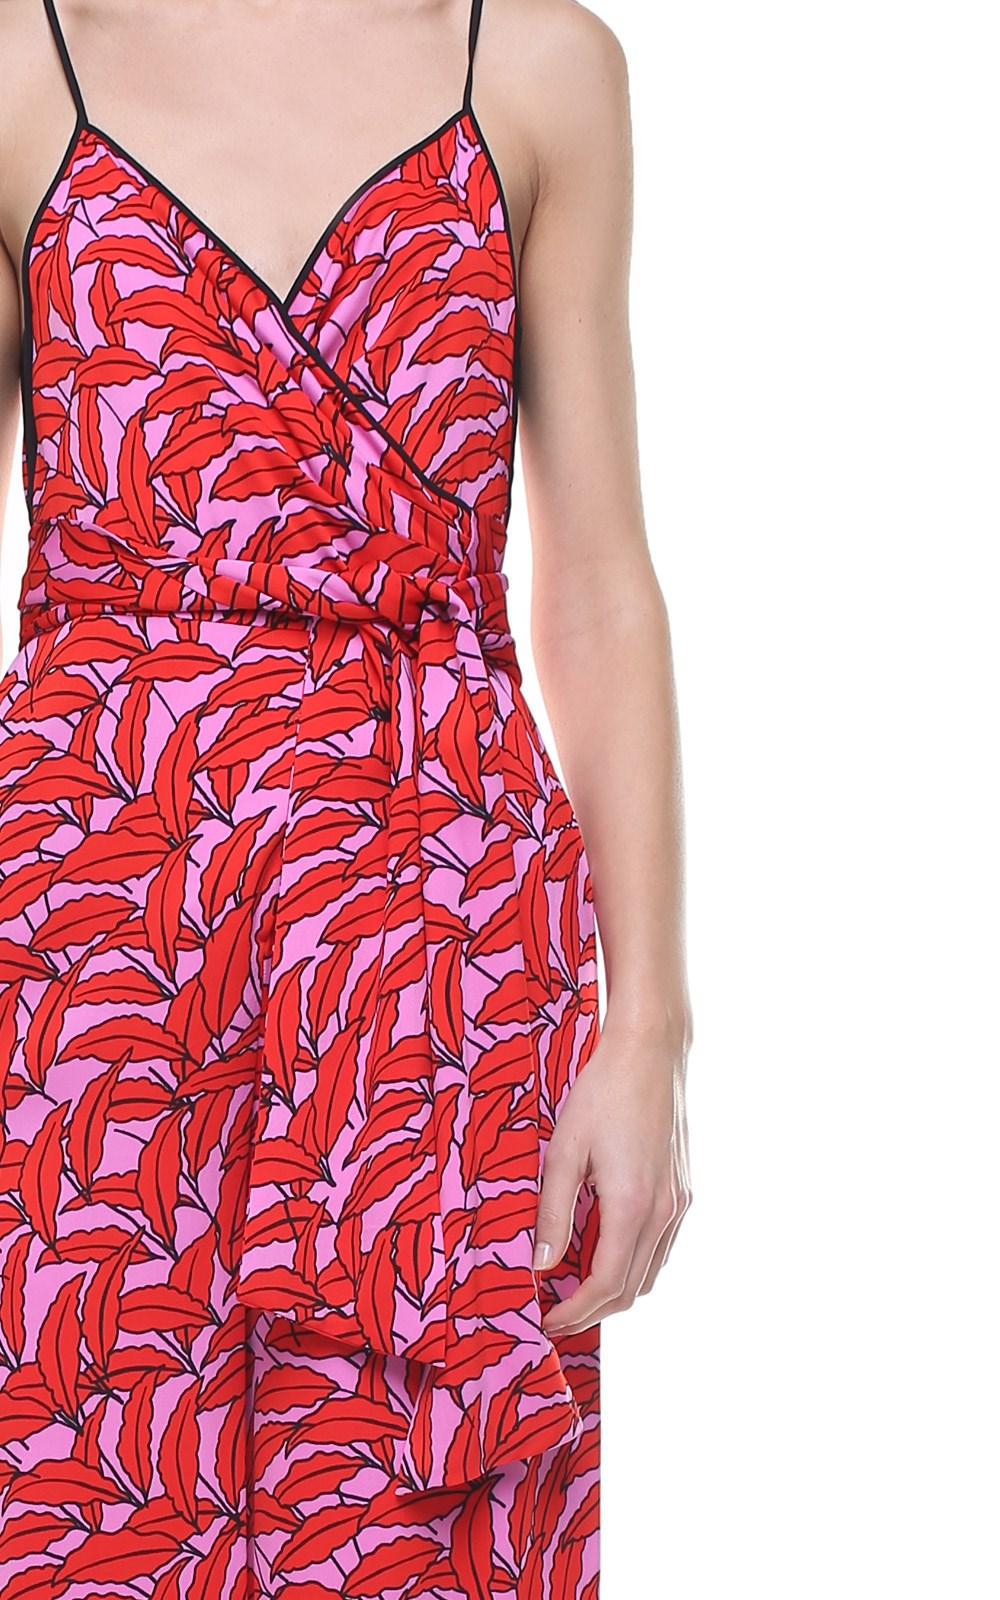 aa333362776 Diane von Furstenberg - Red Barry Windsor Palm-print Viscose-blend Jumpsuit  - Lyst. View fullscreen